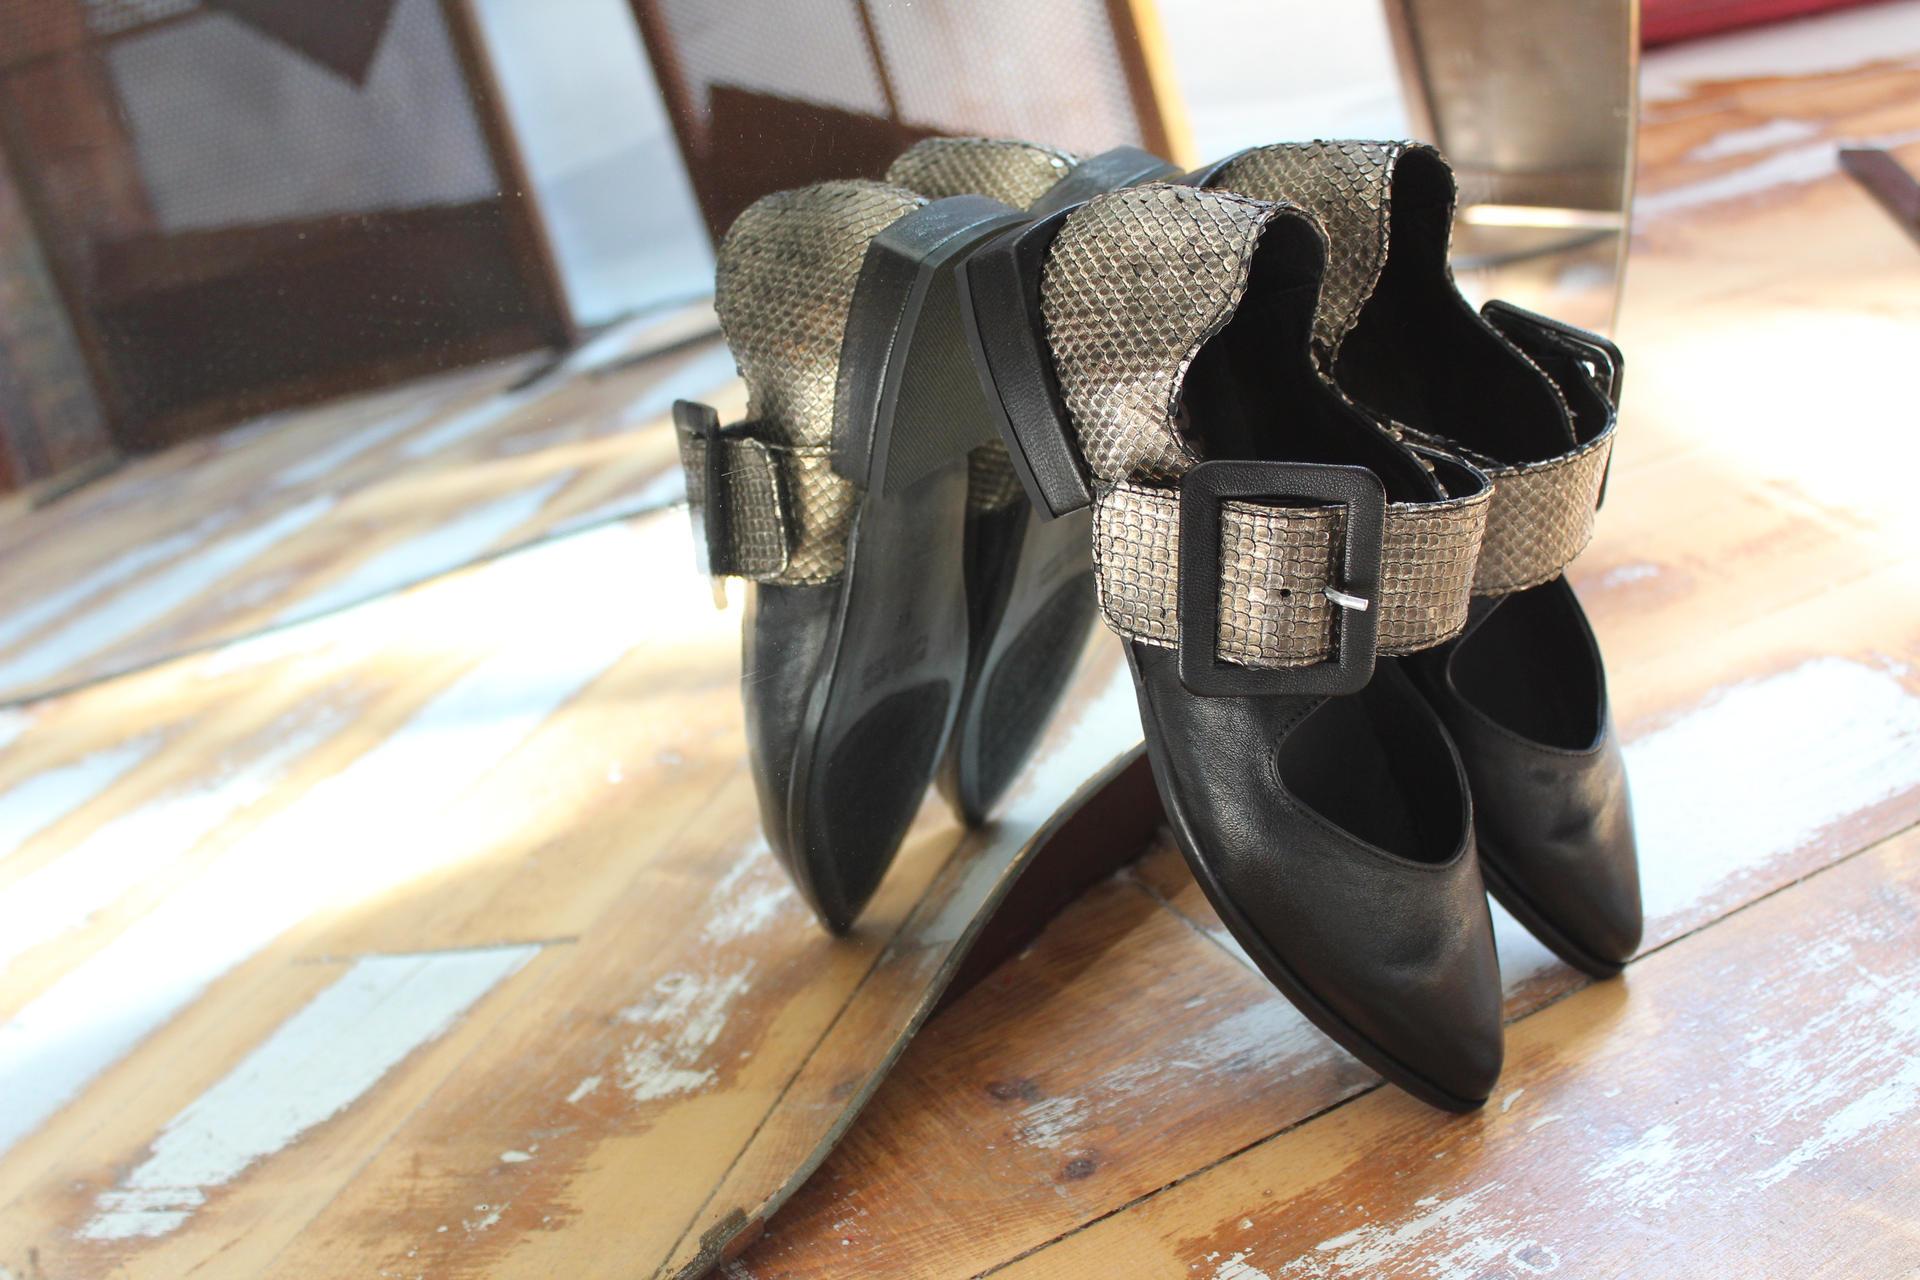 ballerina-nera-argento-inverno-2020-1725a